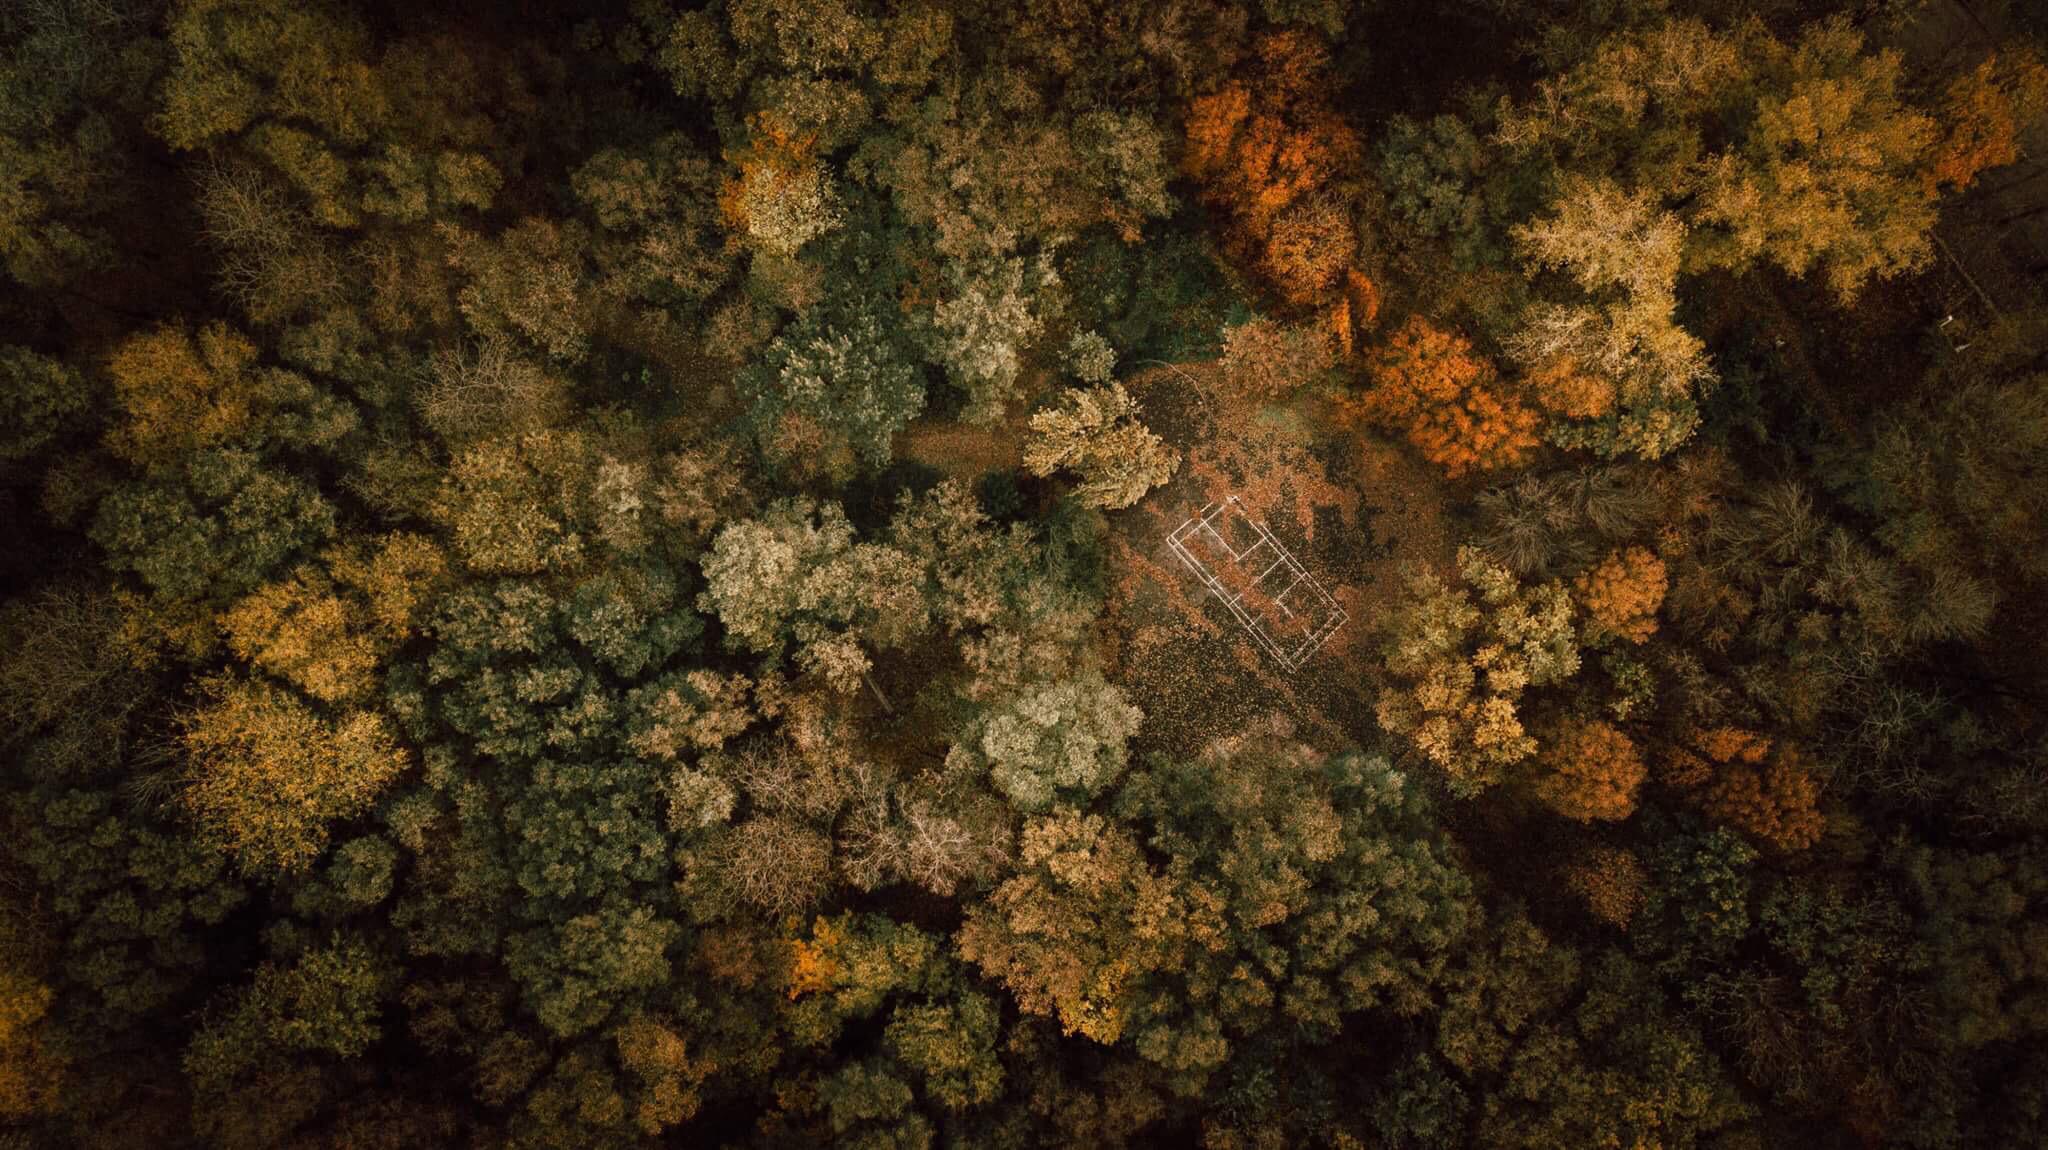 Autumn game, Dnipropetrovsk Oblast, Ukraine. Photo: David Carbonell/AGORA images